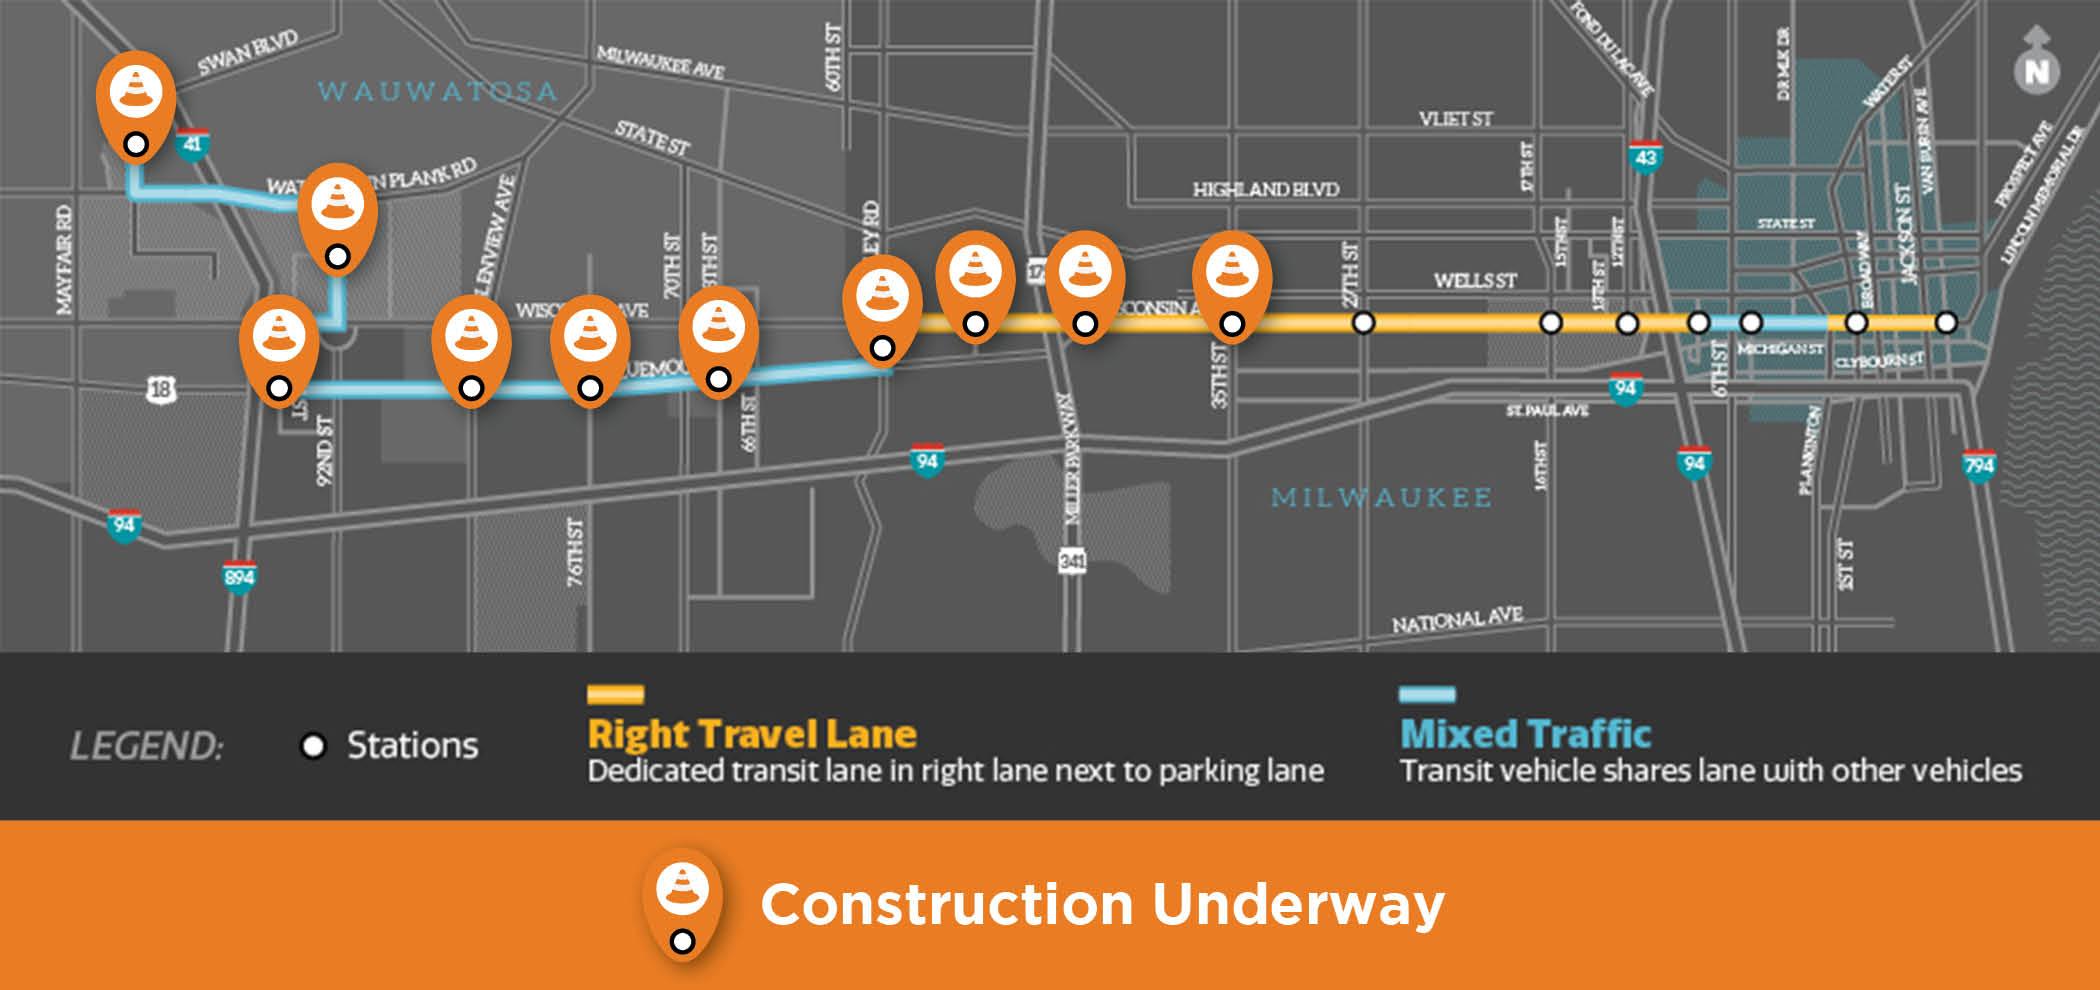 construction-map-9-29-21